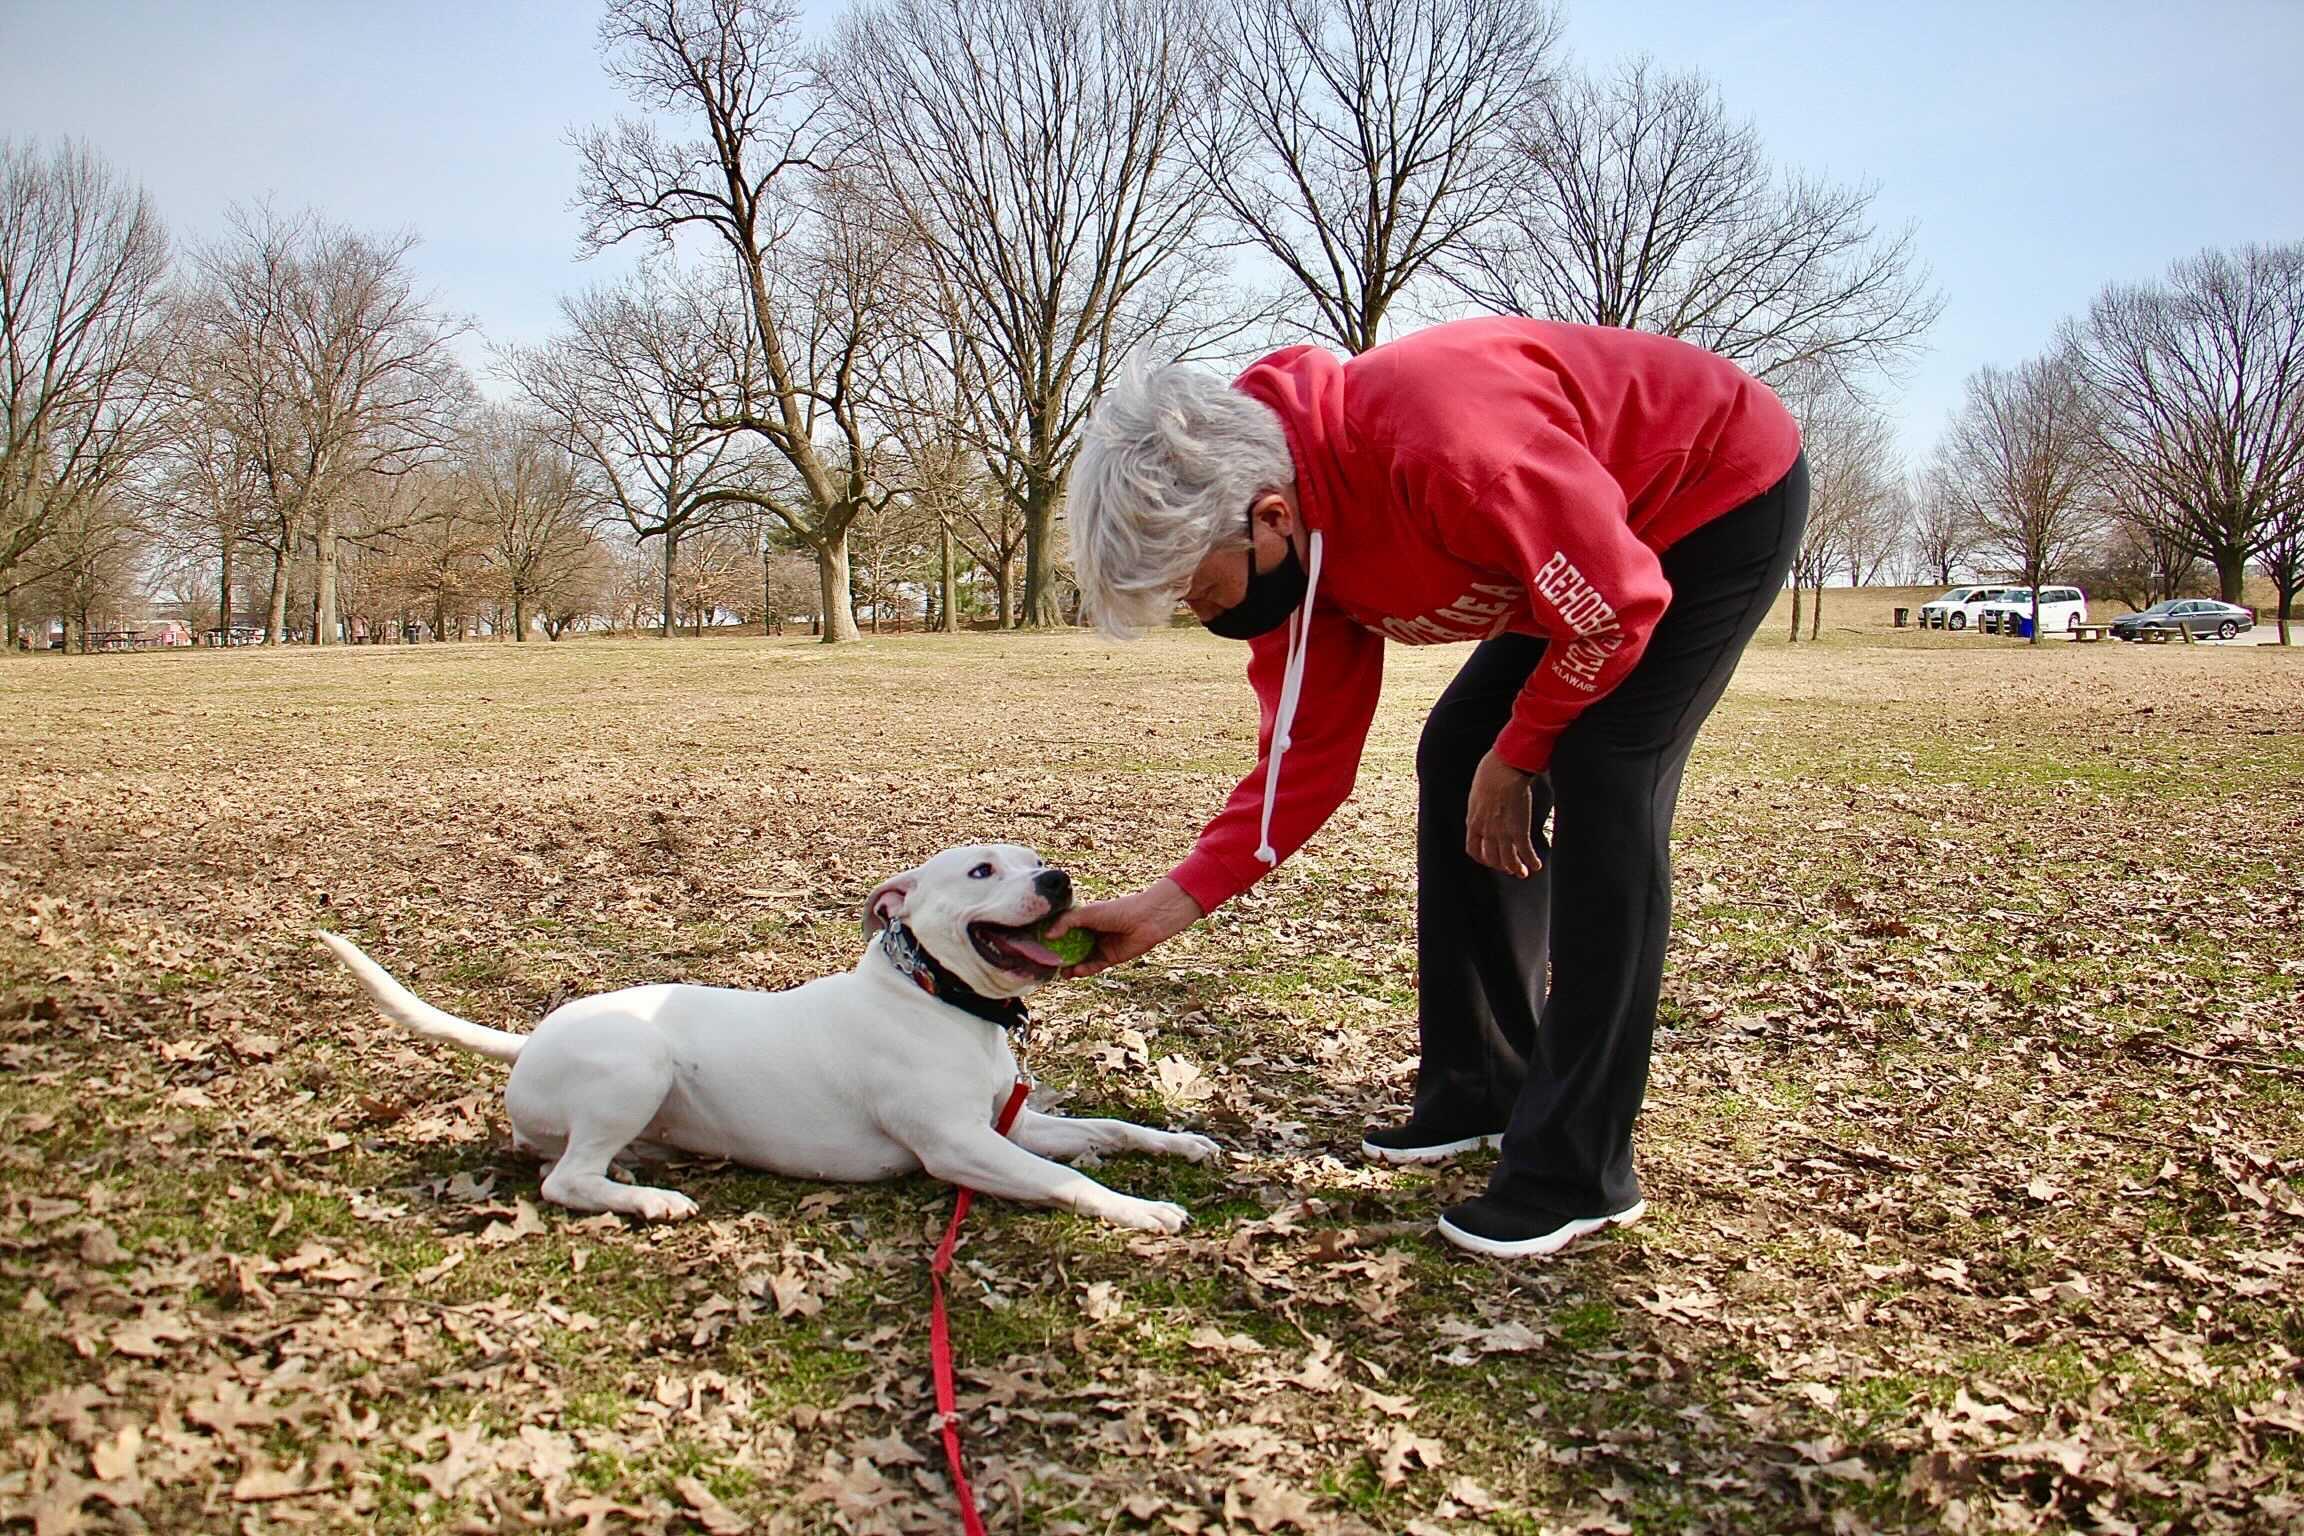 Michelle Davidson plays with her dog, Luna, at FDR Park